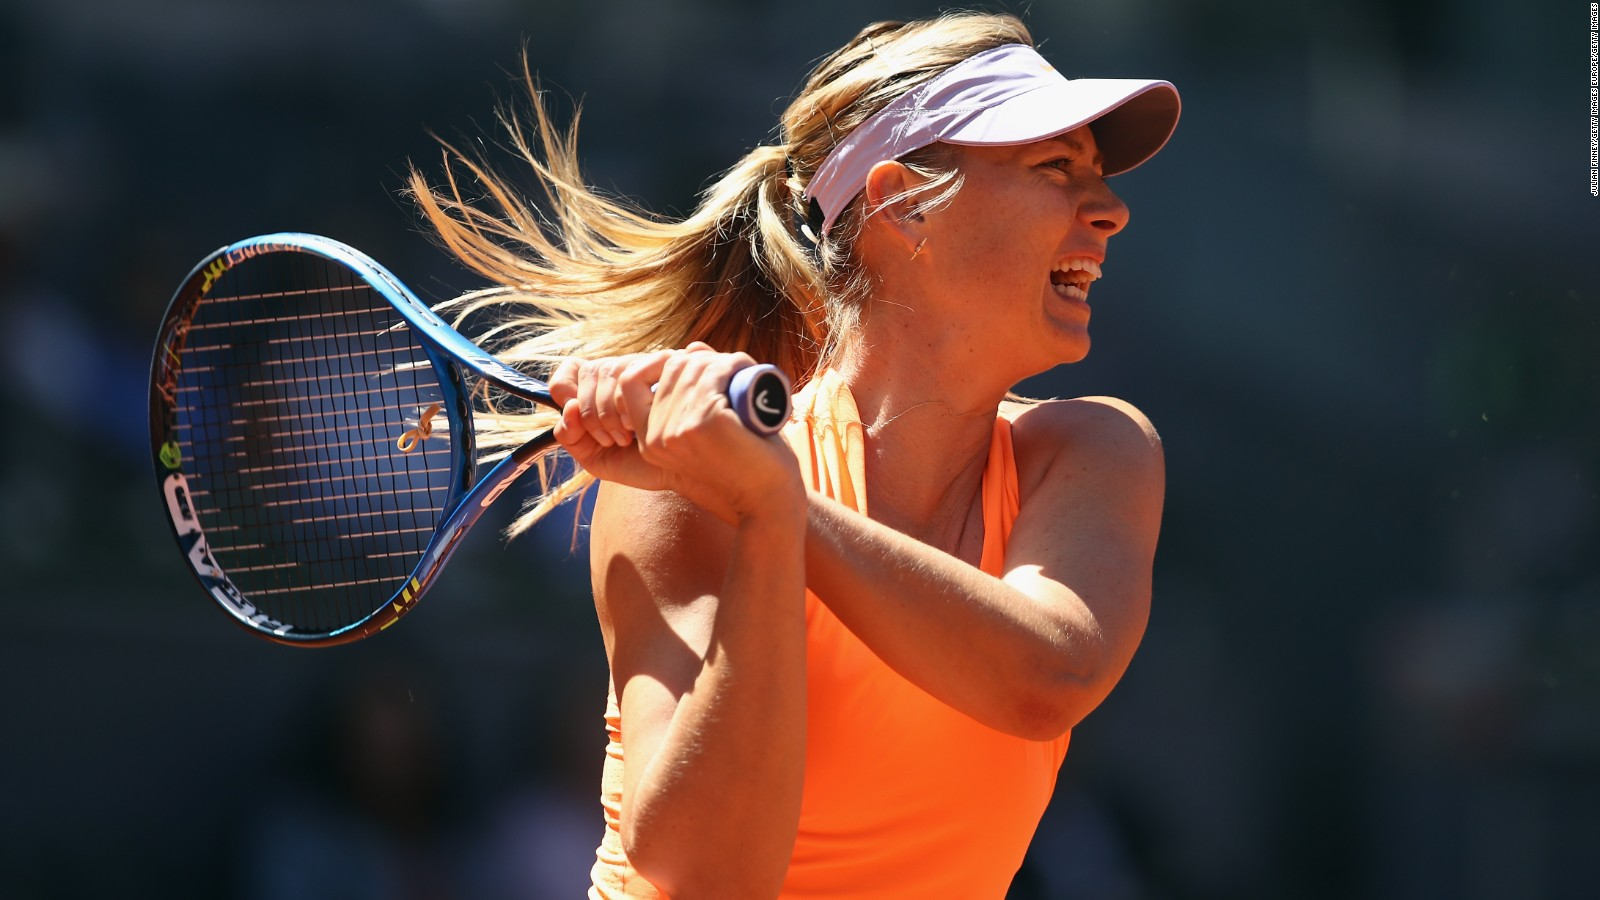 Maria Sharapova's return to tennis